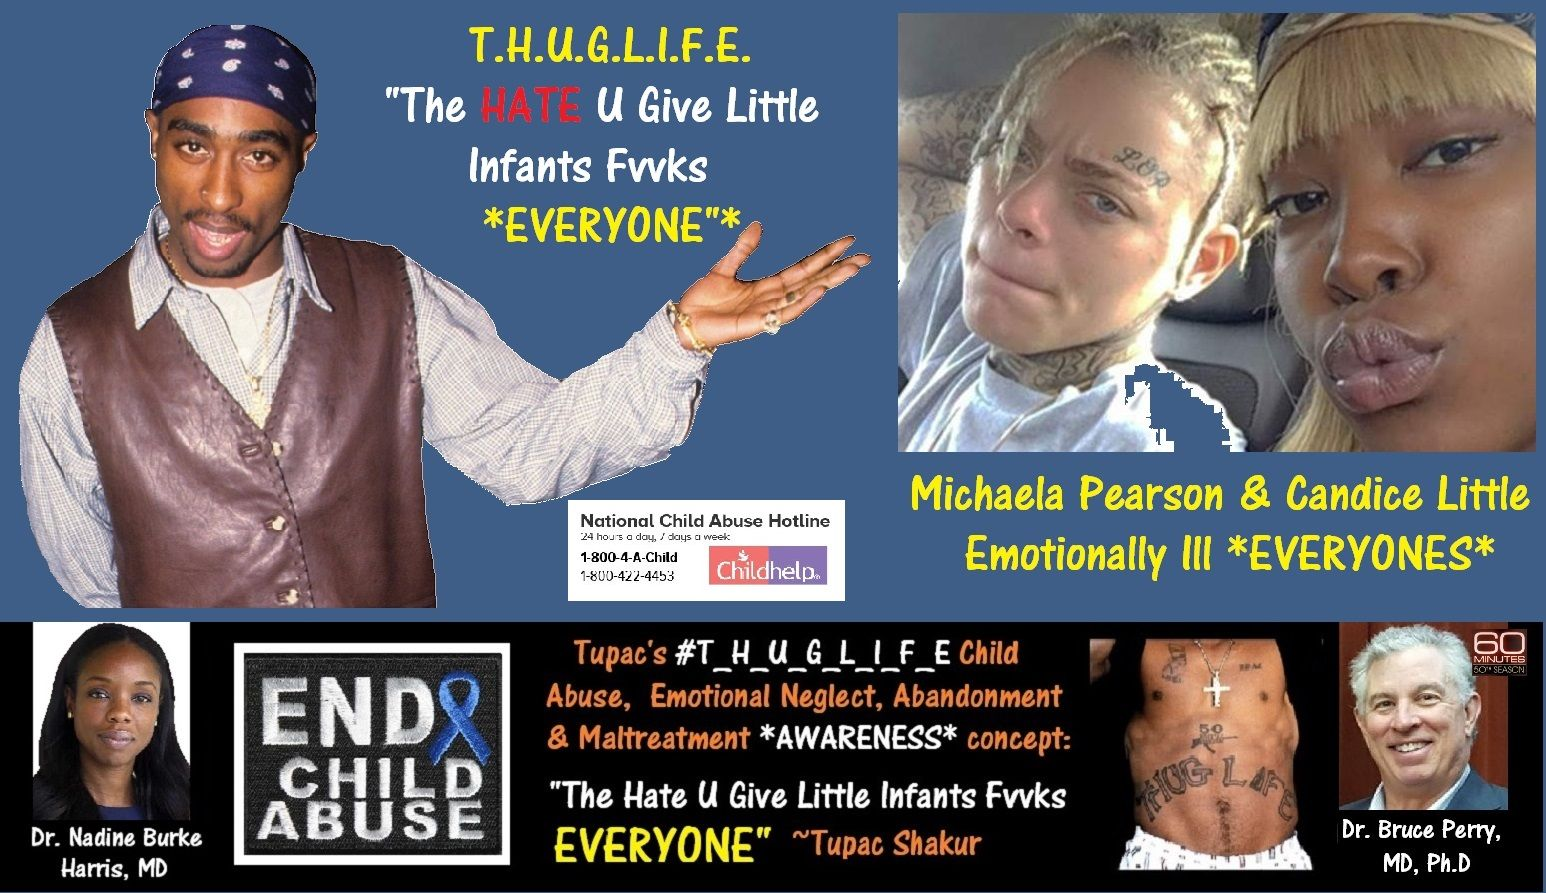 Michaela Pearson, Candice Little, tupac, nadine burke harris.jpg